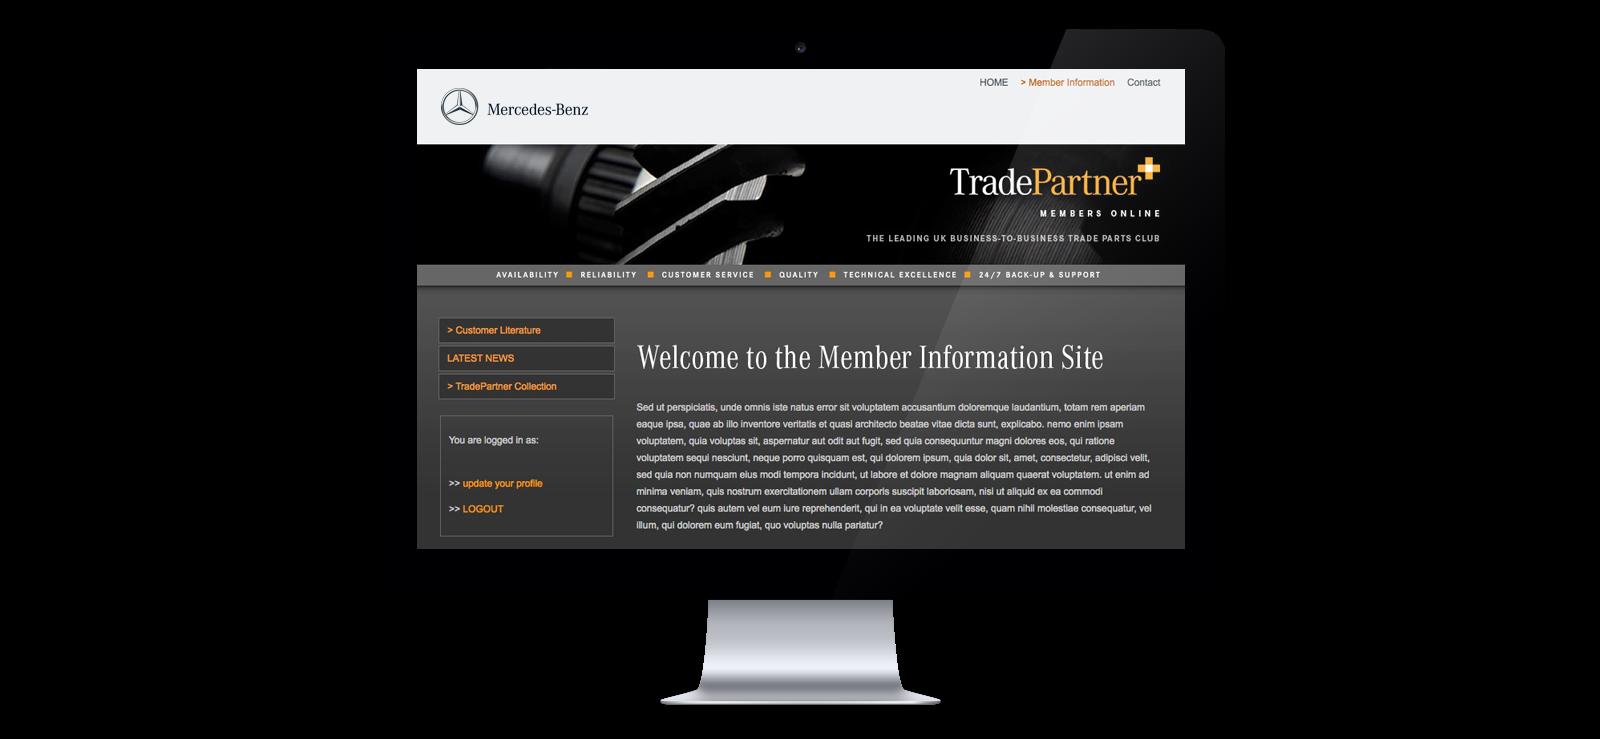 imac_tradepartner2